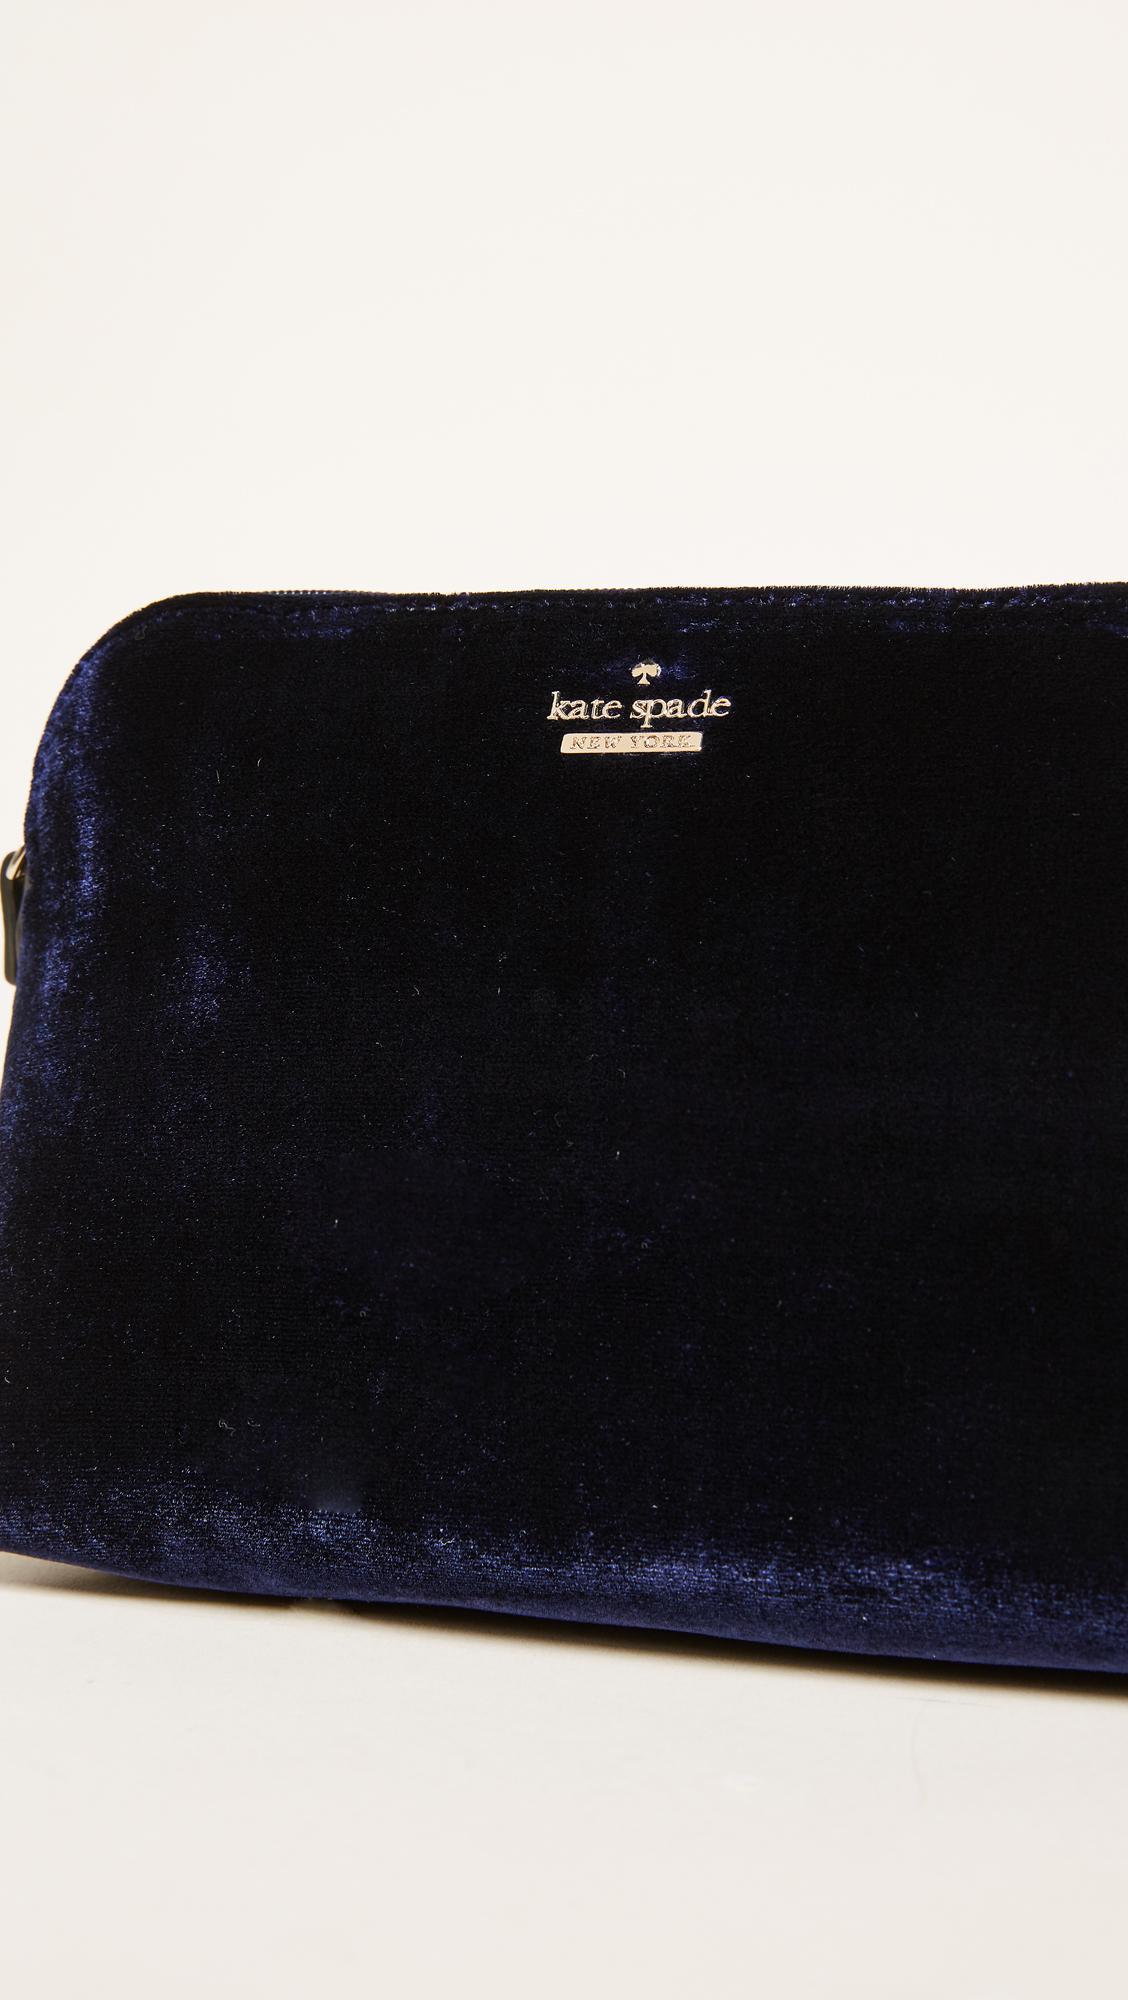 41651a40d171 Kate Spade Watson Lane Velvet Small Briley Small Makeup Bag in Black ...